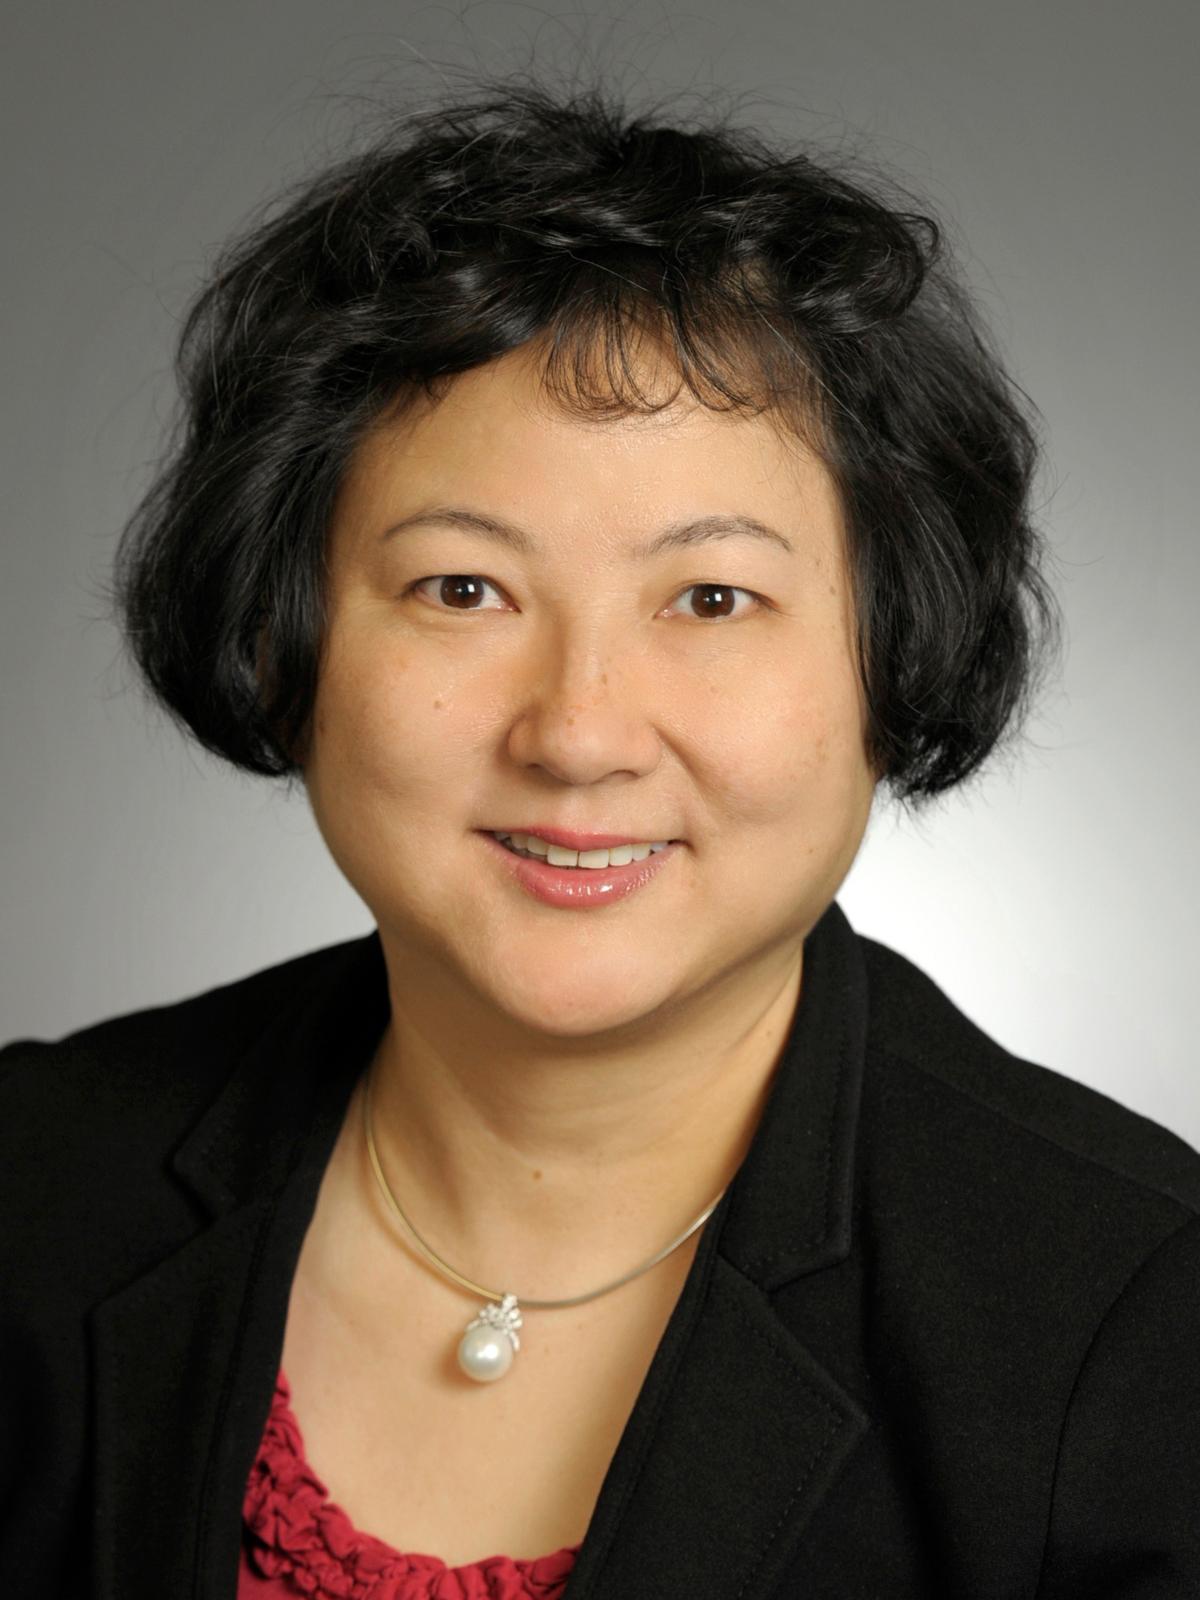 Ms. Mercy Yan